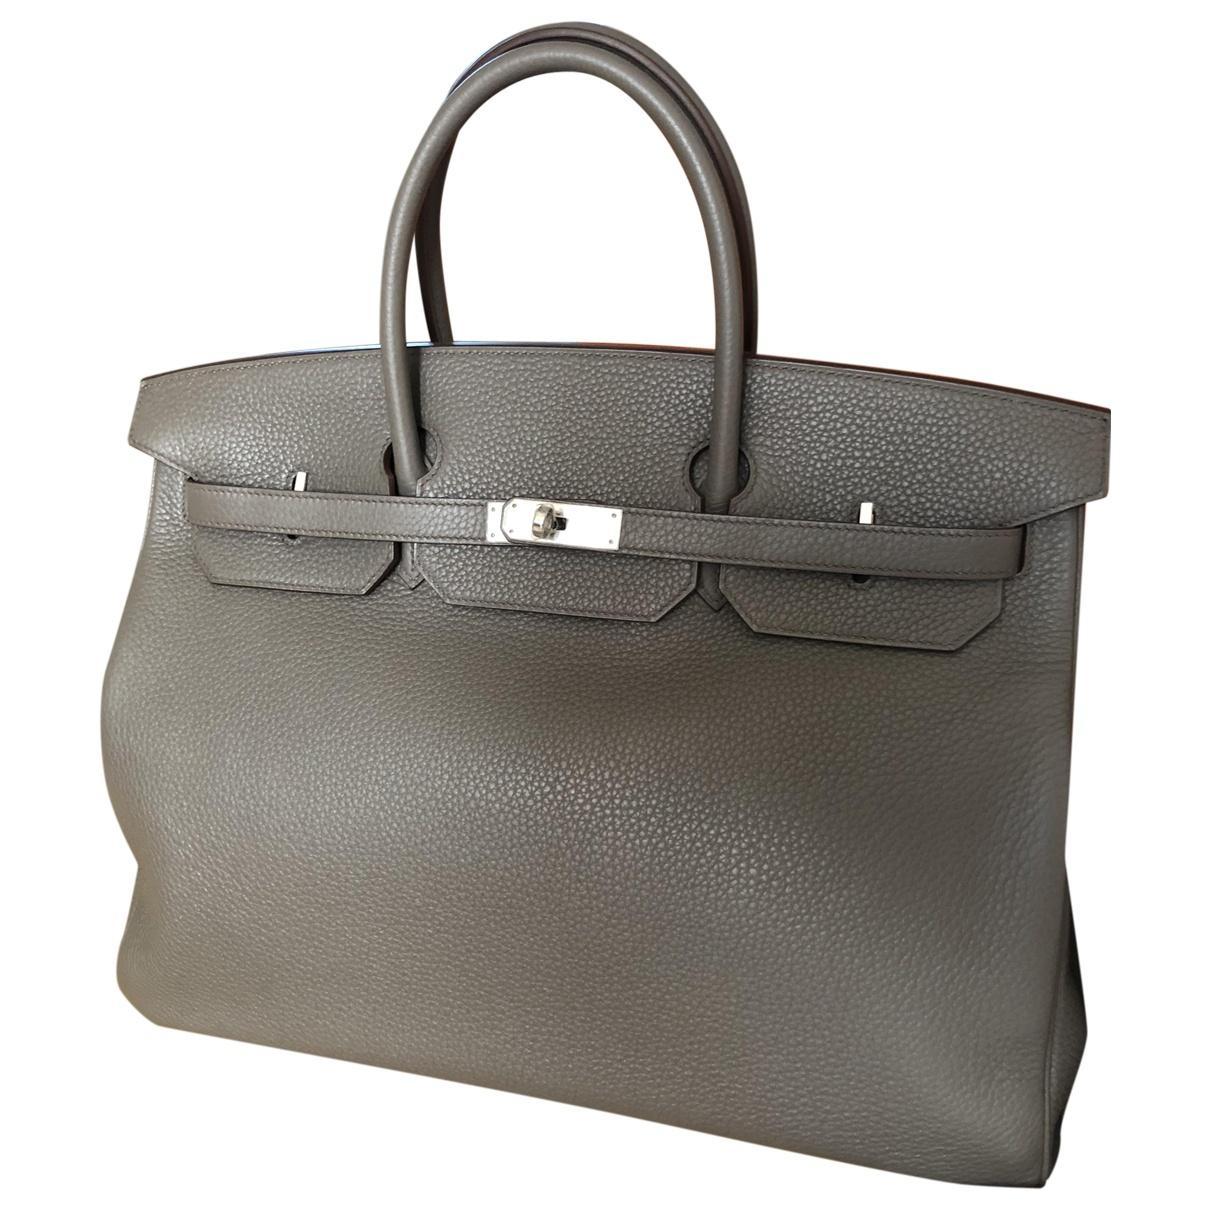 c6b7938791 Hermès. Women s Black Birkin 40 Leather Handbag. £9